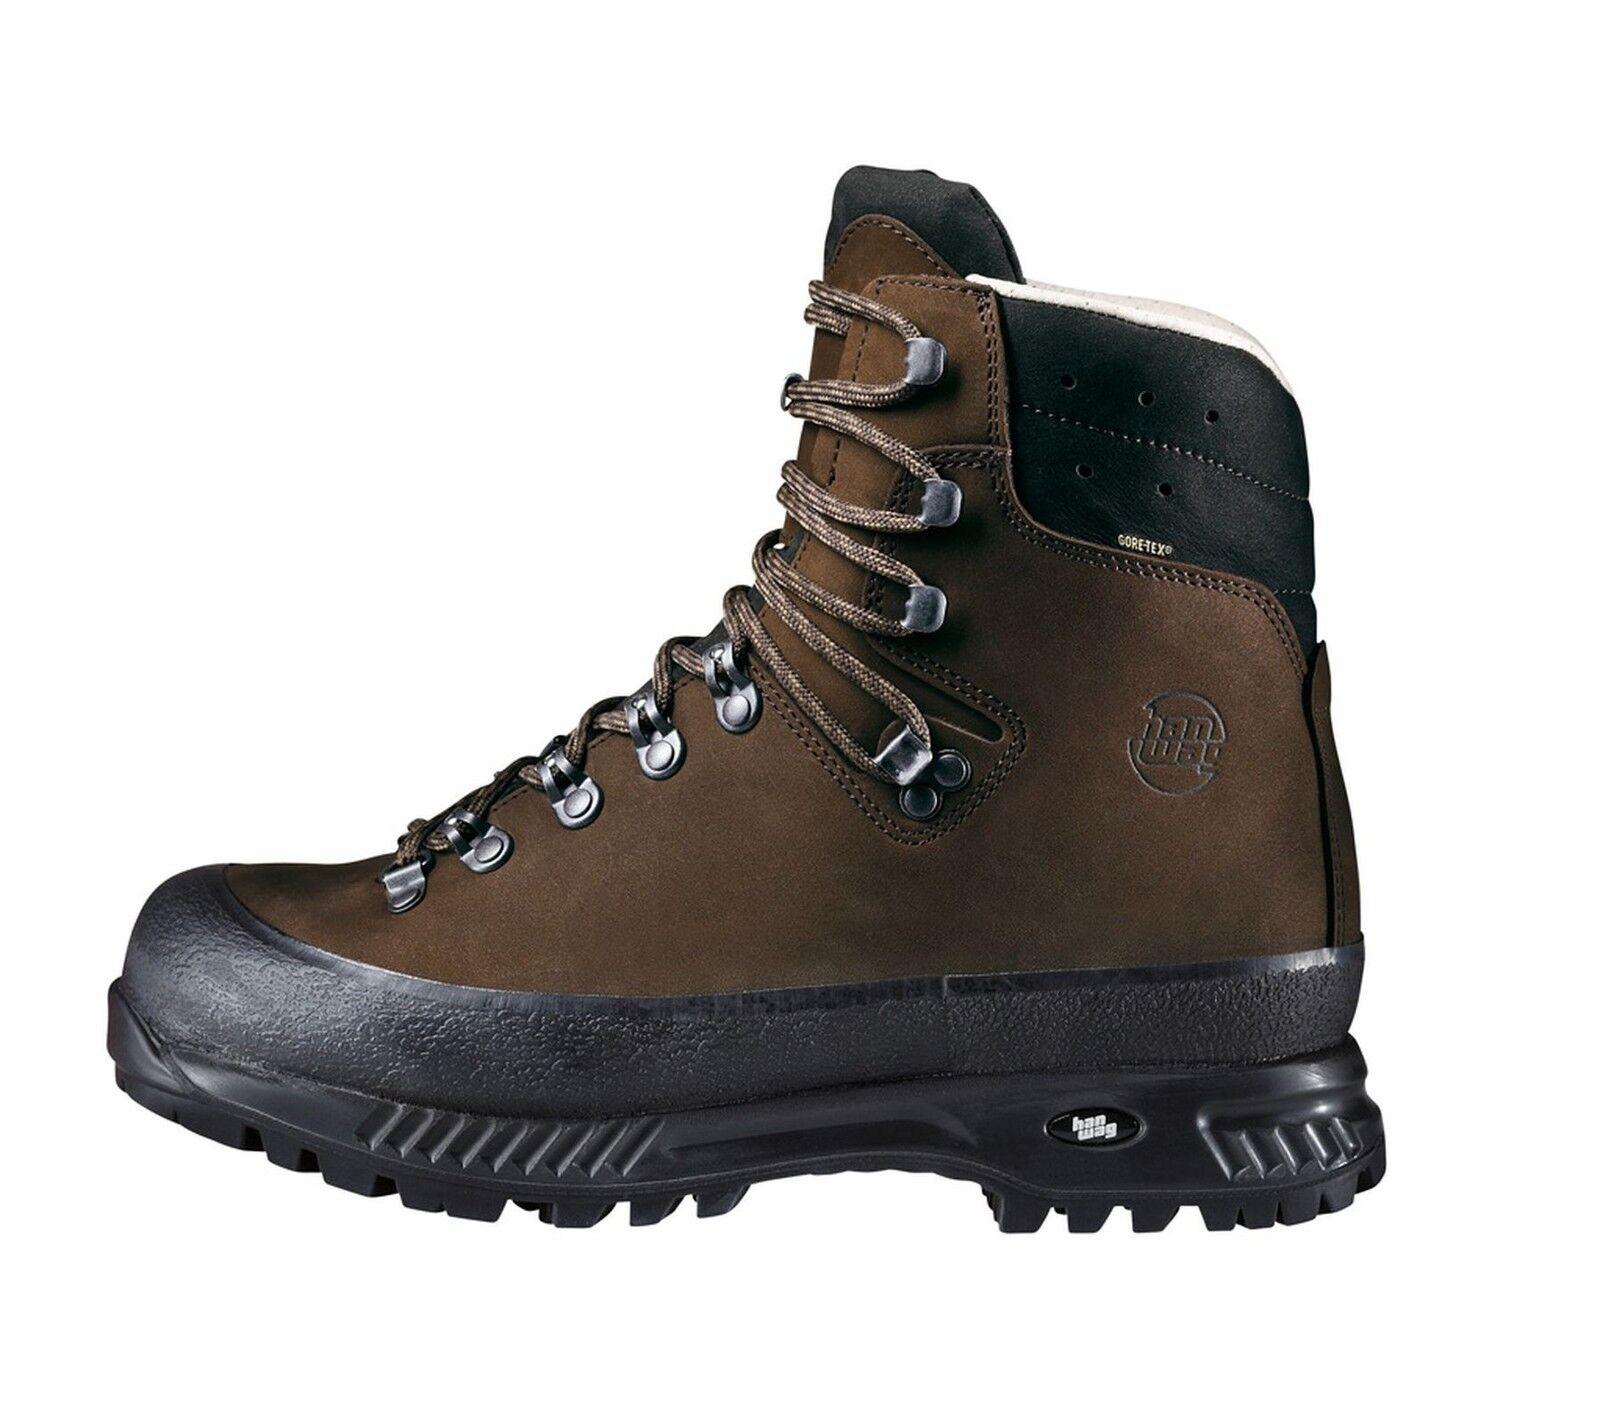 Hanwag Mountain shoes  Alaska Wide GTX Men Size 10,5 - 45 Earth